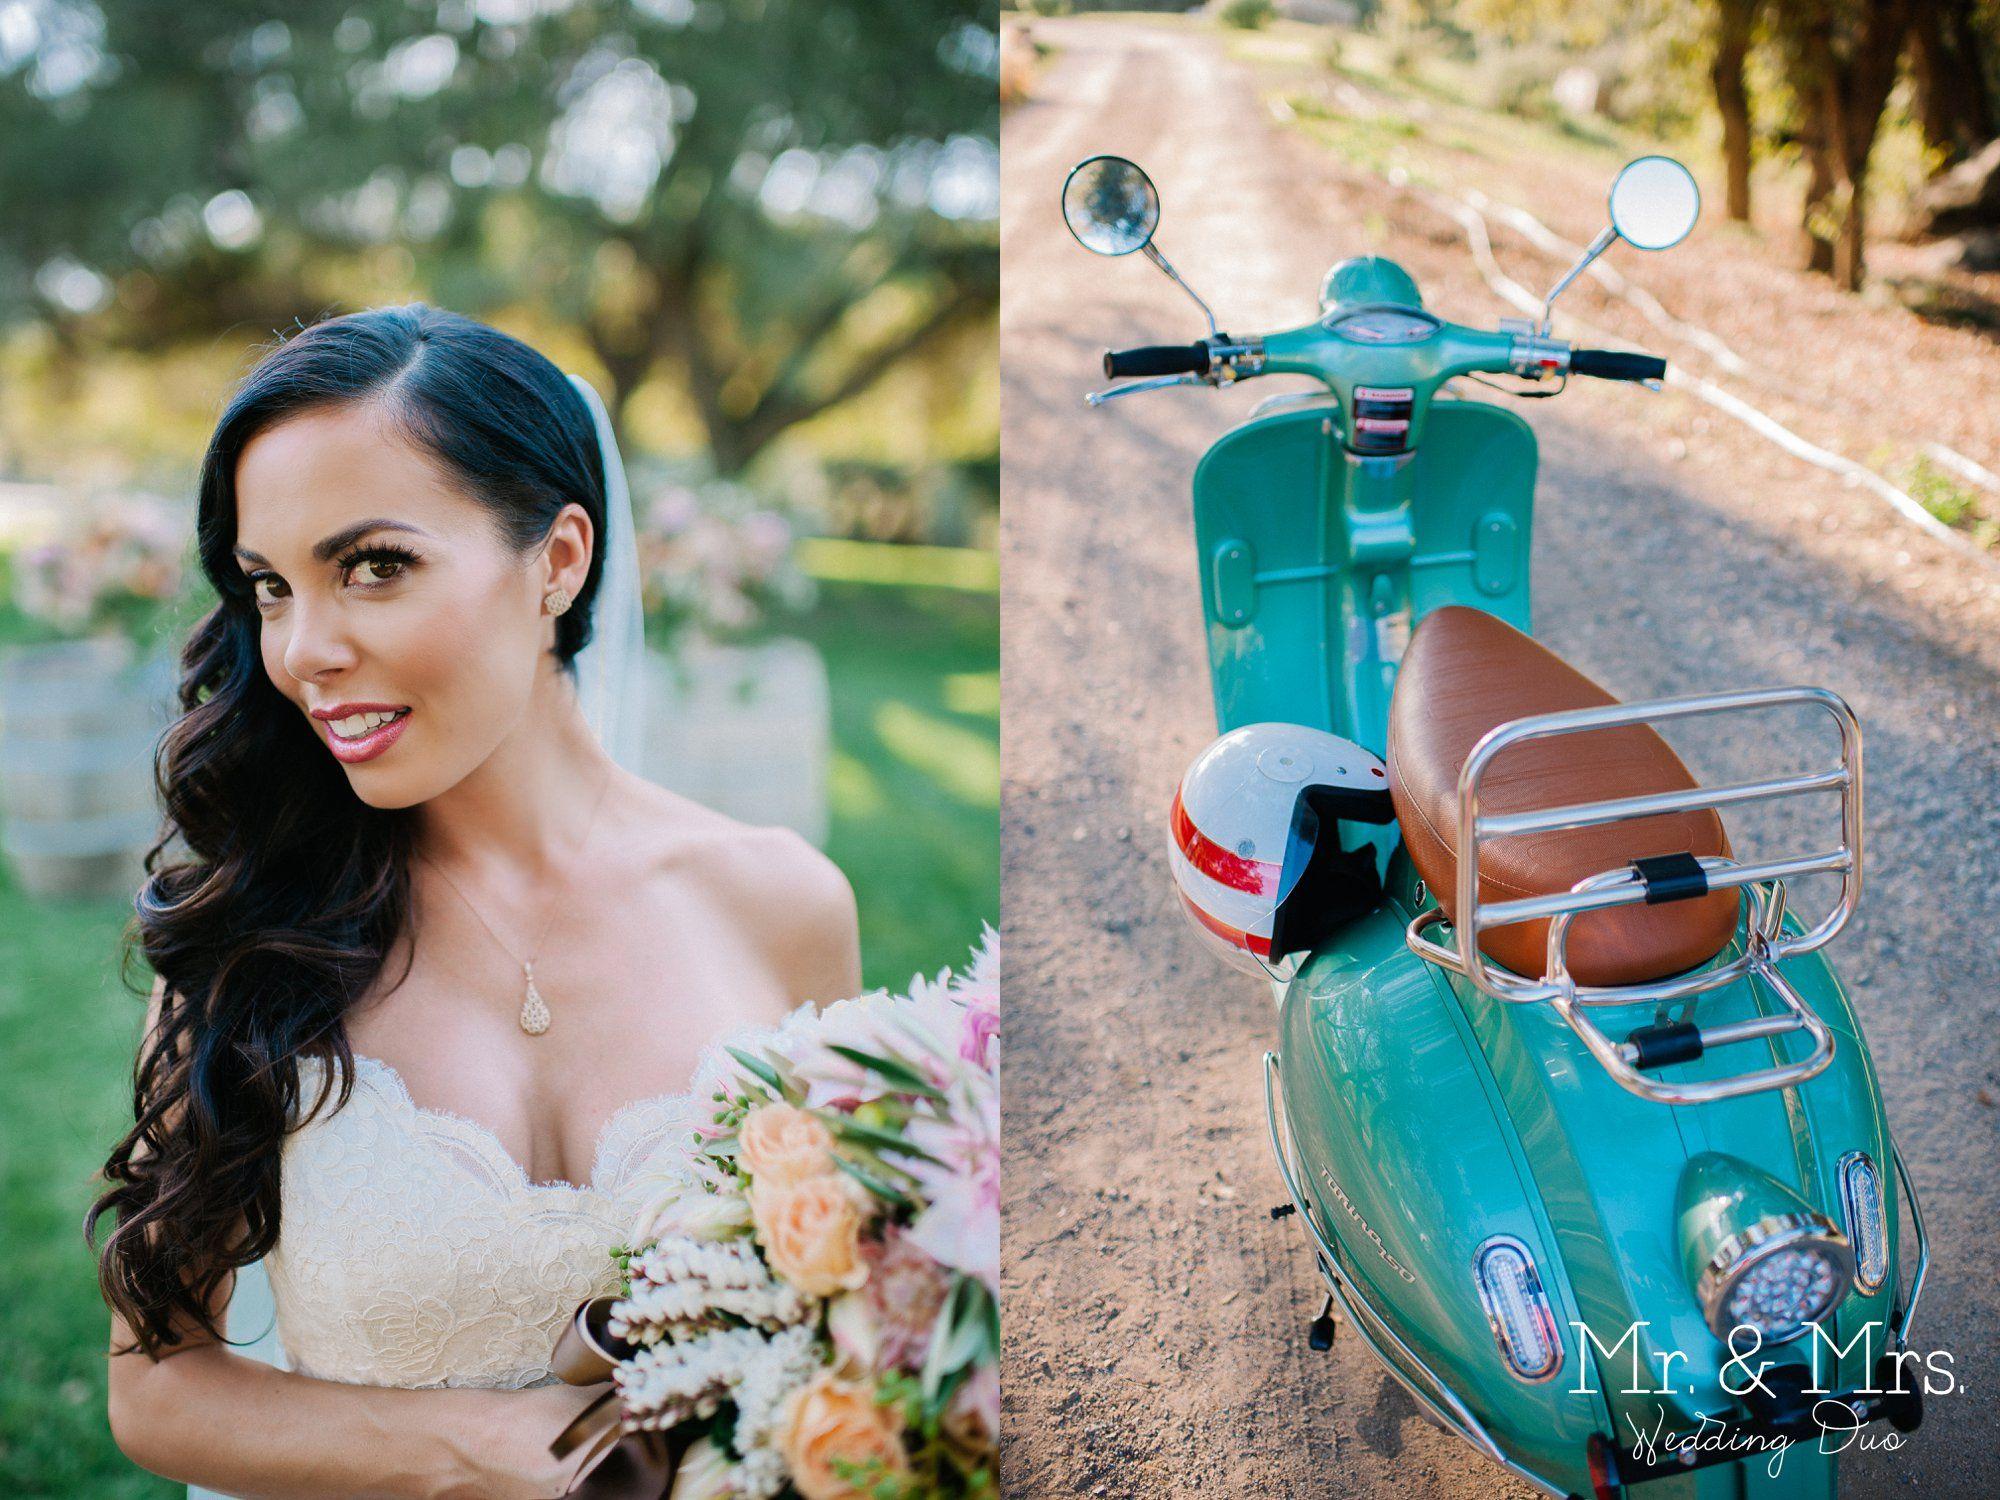 bride + mint green vespa = Italian Wedding Photo